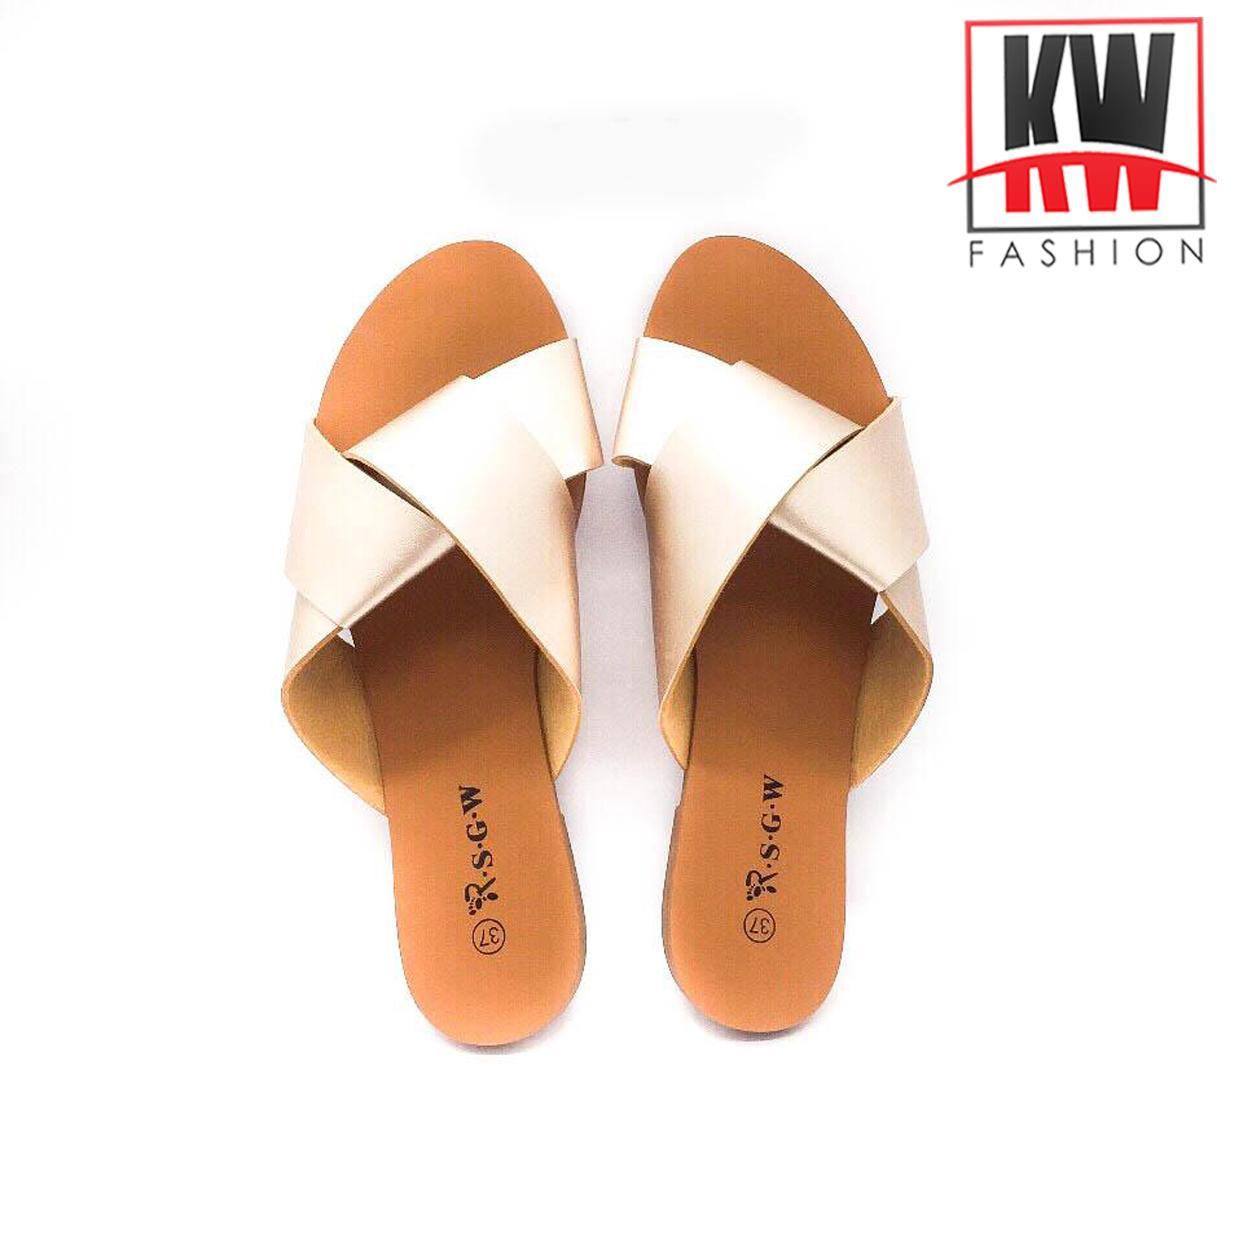 7ded45d46ccb Flat Sandals for Women for sale - Summer Sandals online brands ...